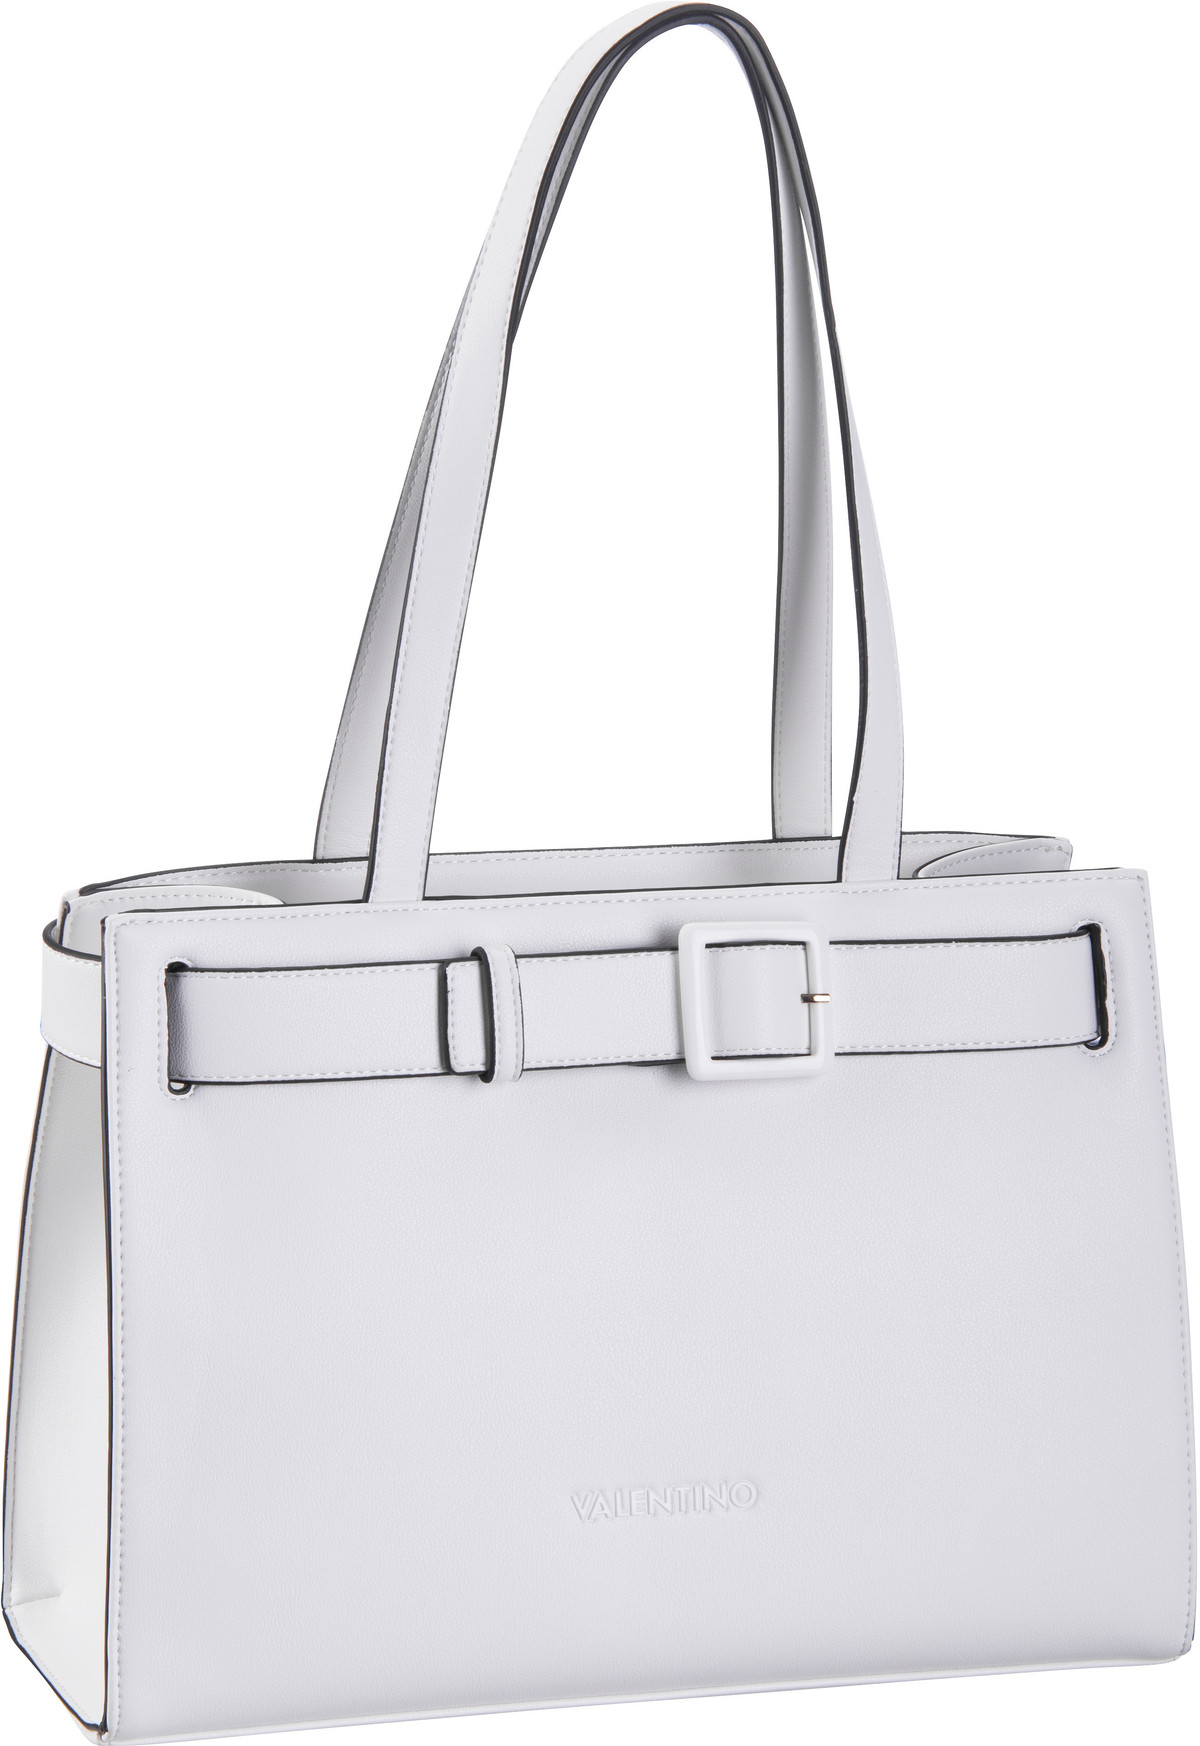 Bags Handtasche Angelo Shopping H01 Bianco